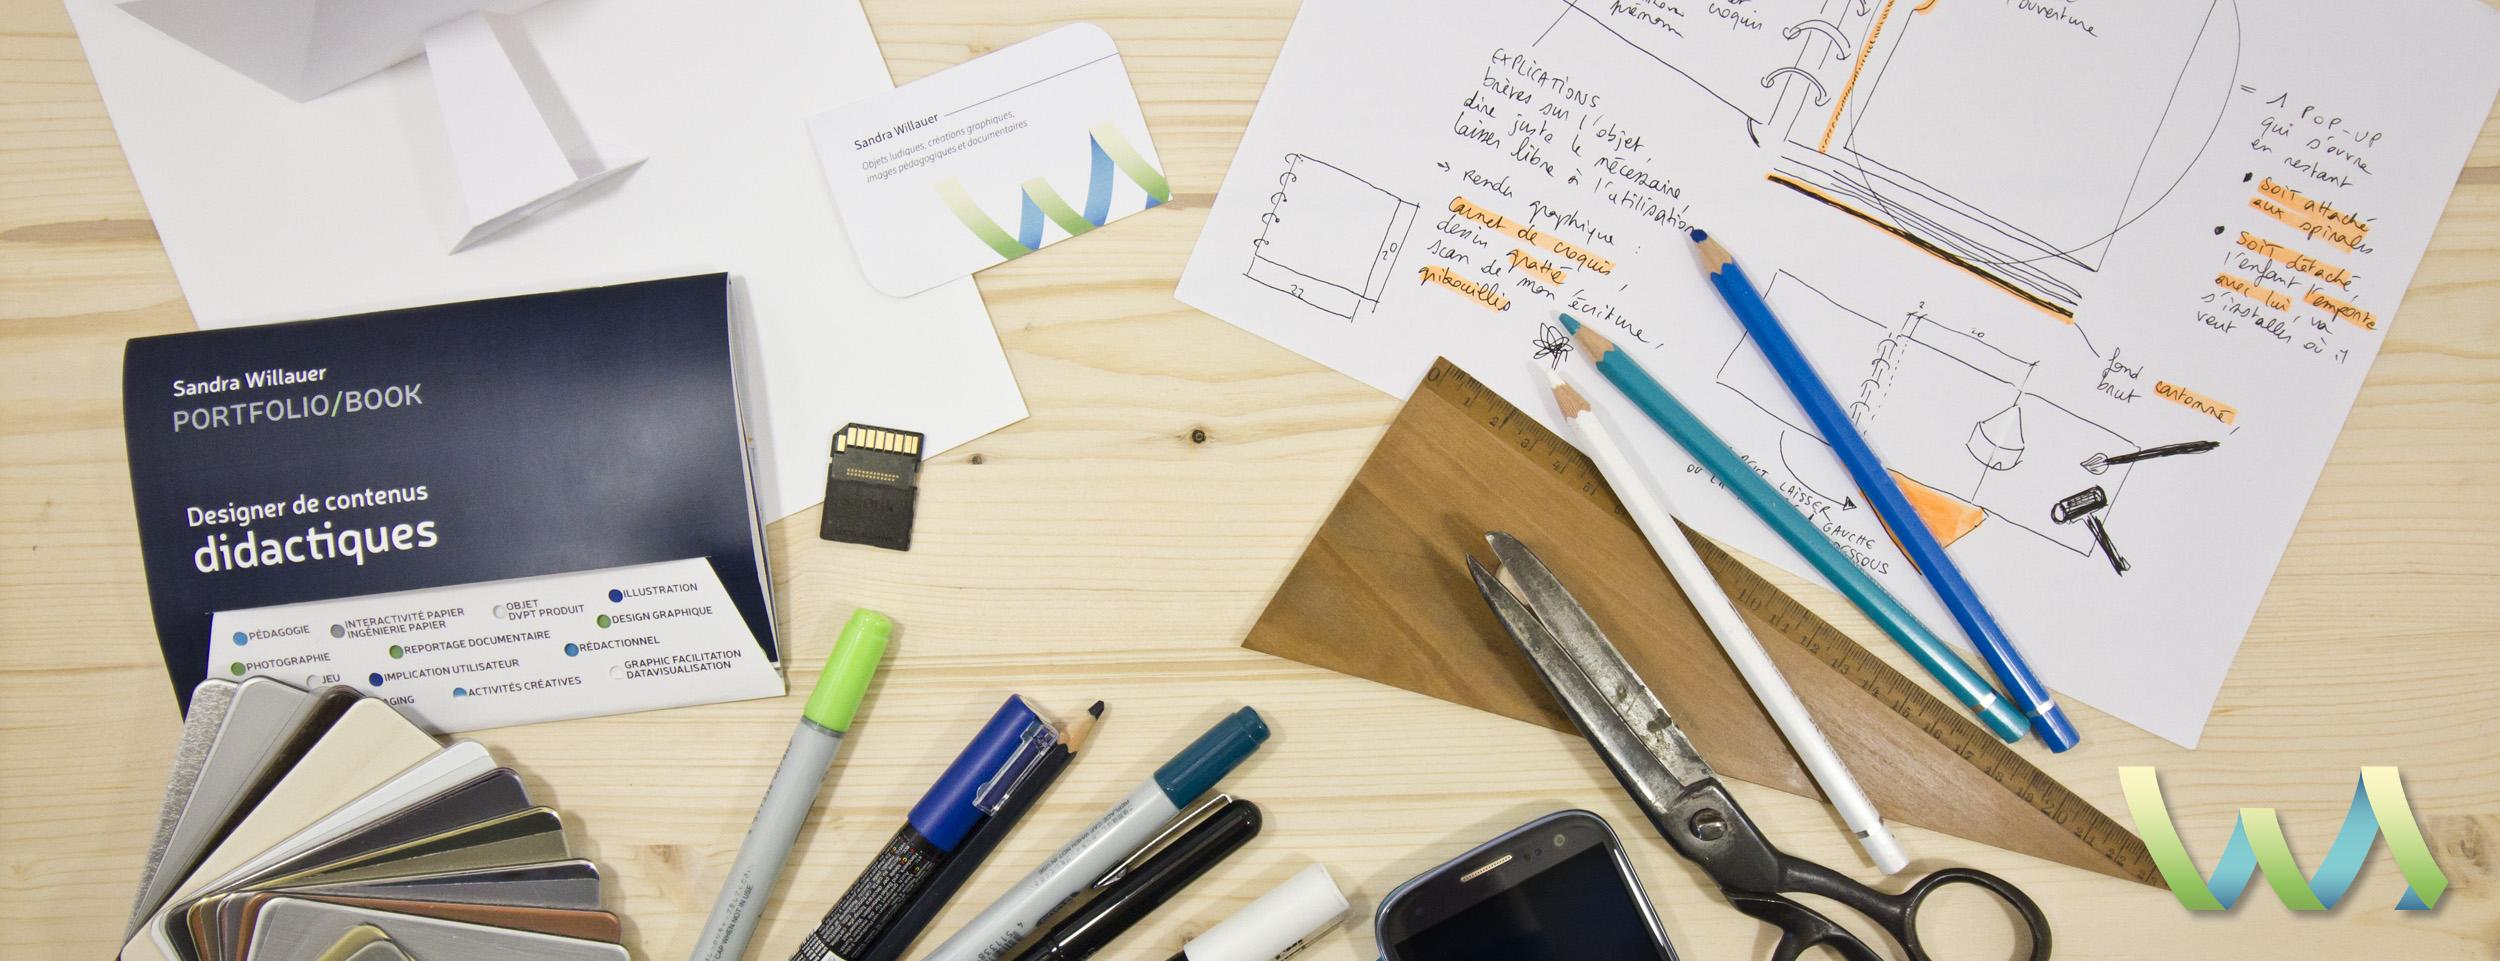 bureau et outils de Sandra Willauer